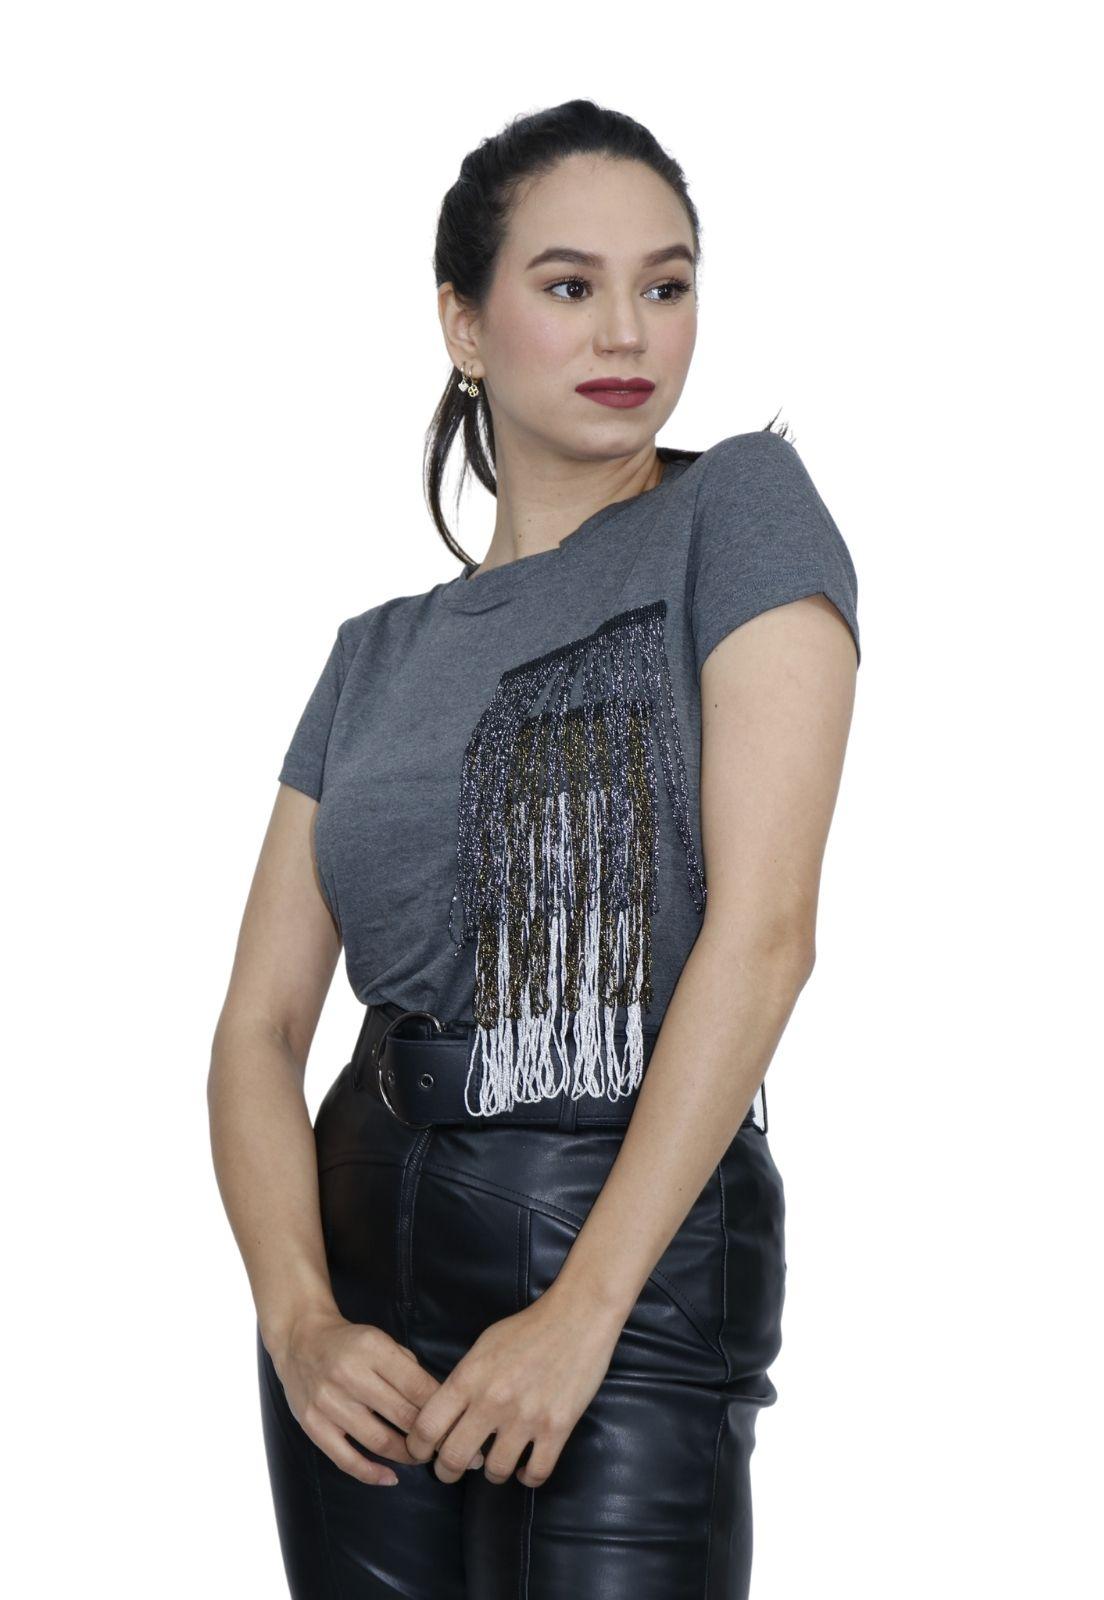 Camiseta Feminina T-shirt Viscolycra Franja Lurex